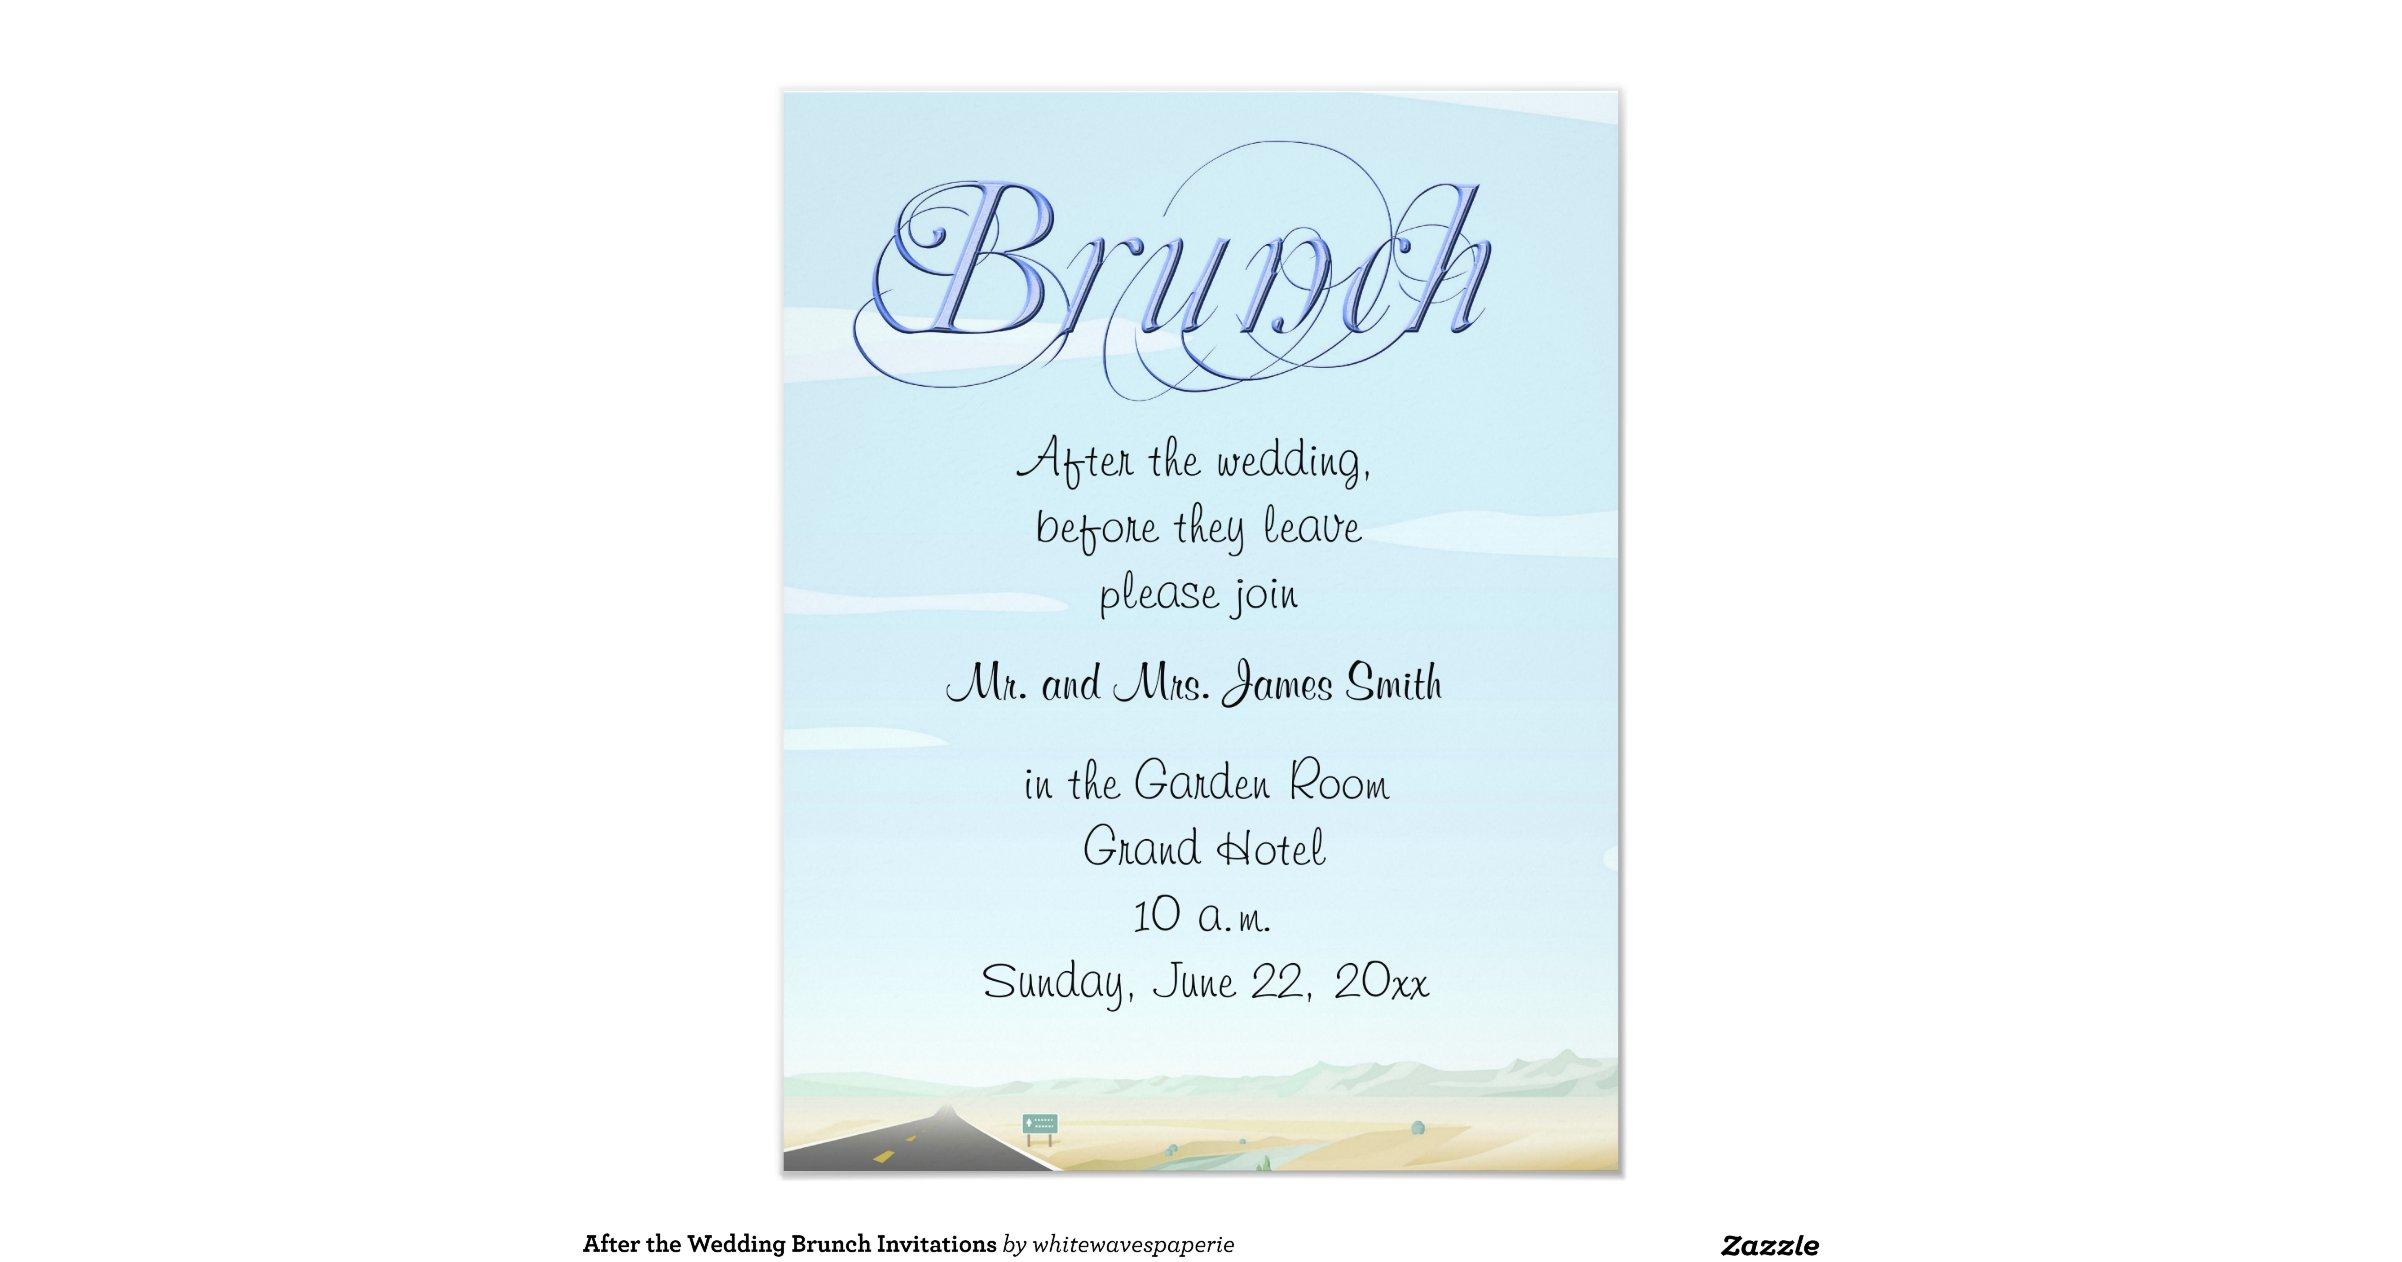 wedding brunch reception invitation wording - 28 images - bridal ...